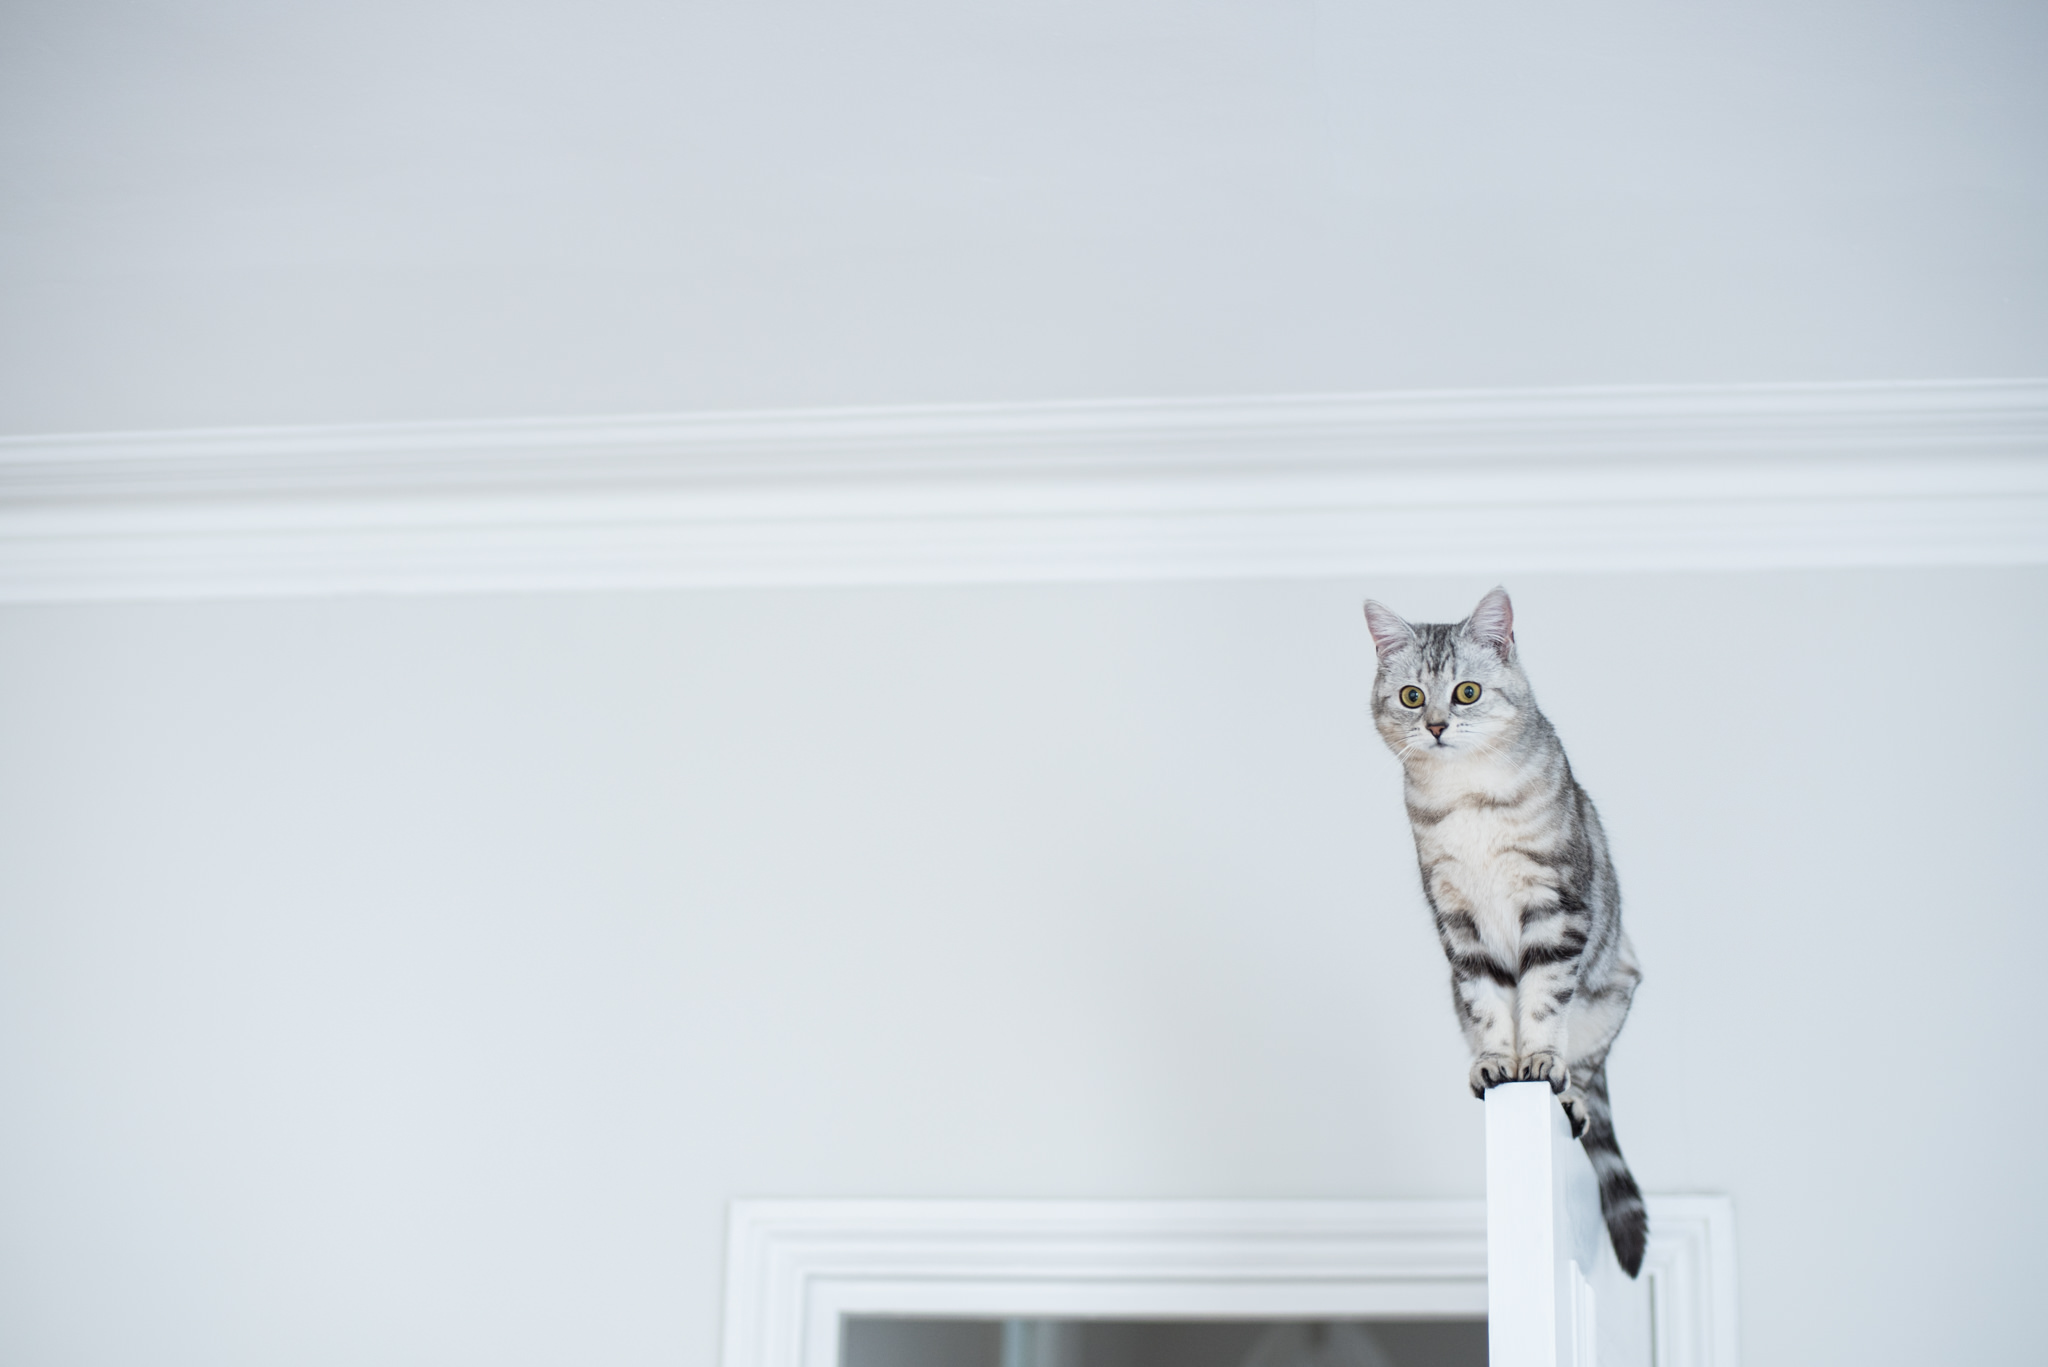 cecily-amazing-balancing-cat-door-london-grey-white-black.jpg